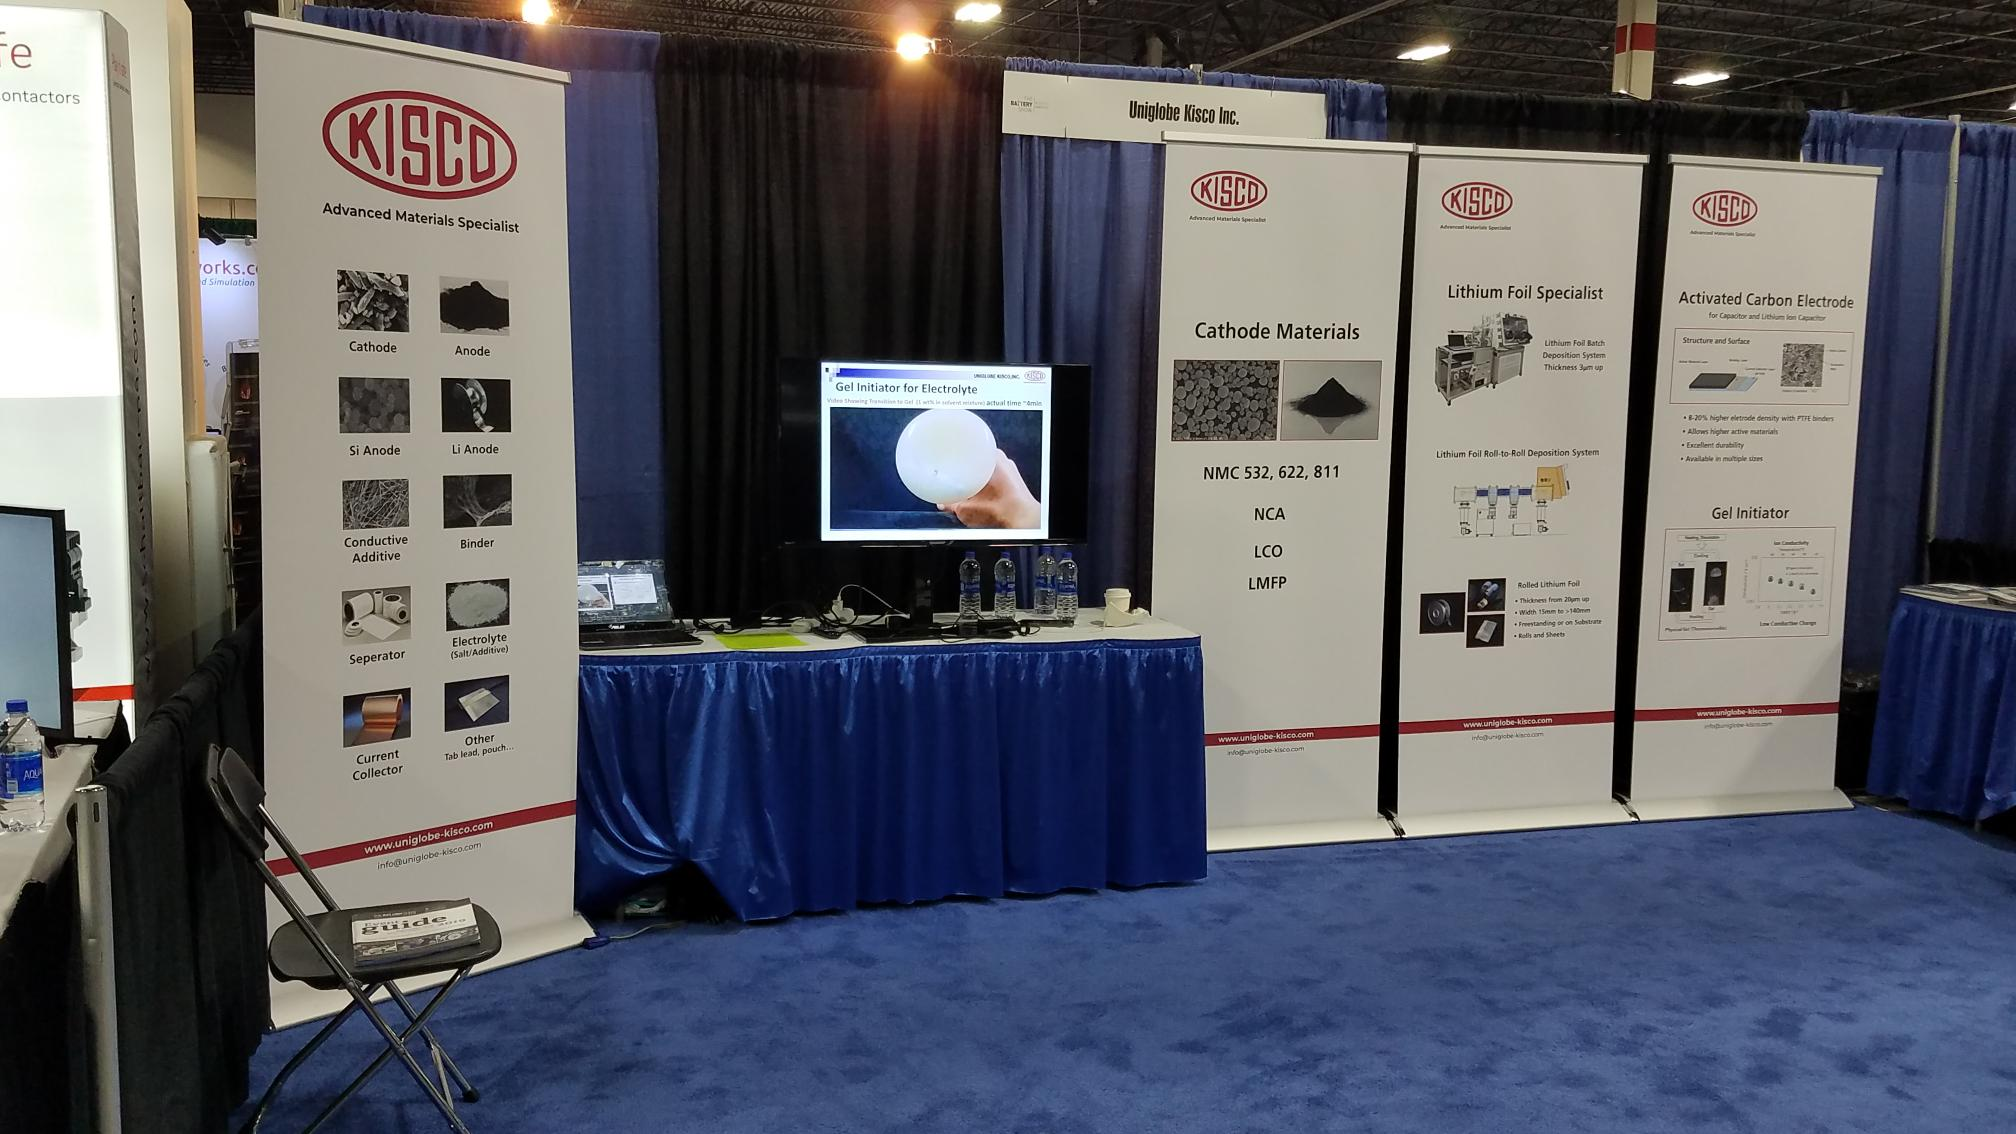 Uniglobe Kisco Battery Show Booth Title